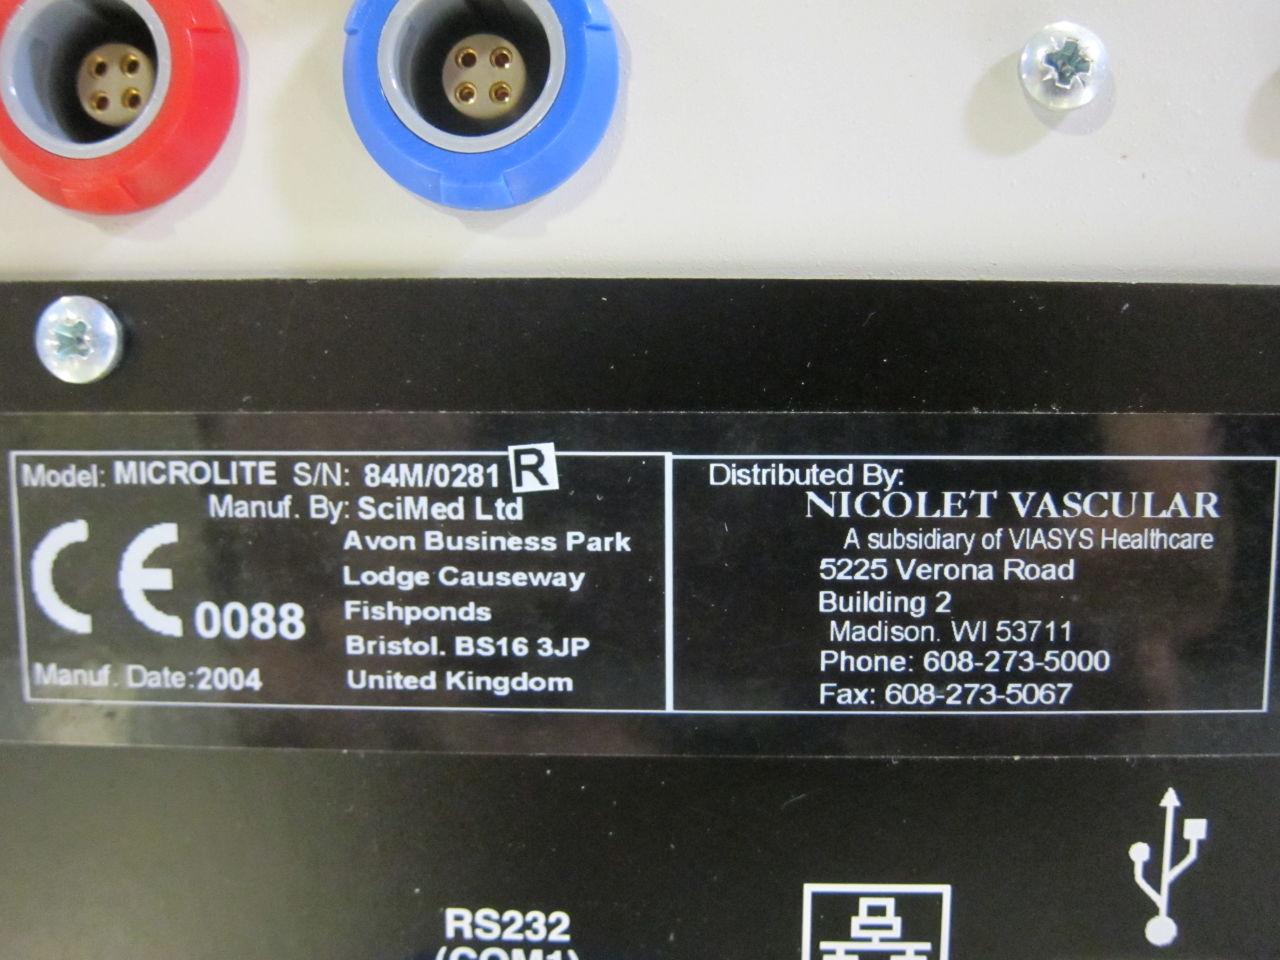 SCIMED Vasoguard Microlite Ultrasound Cardiac - Vascular